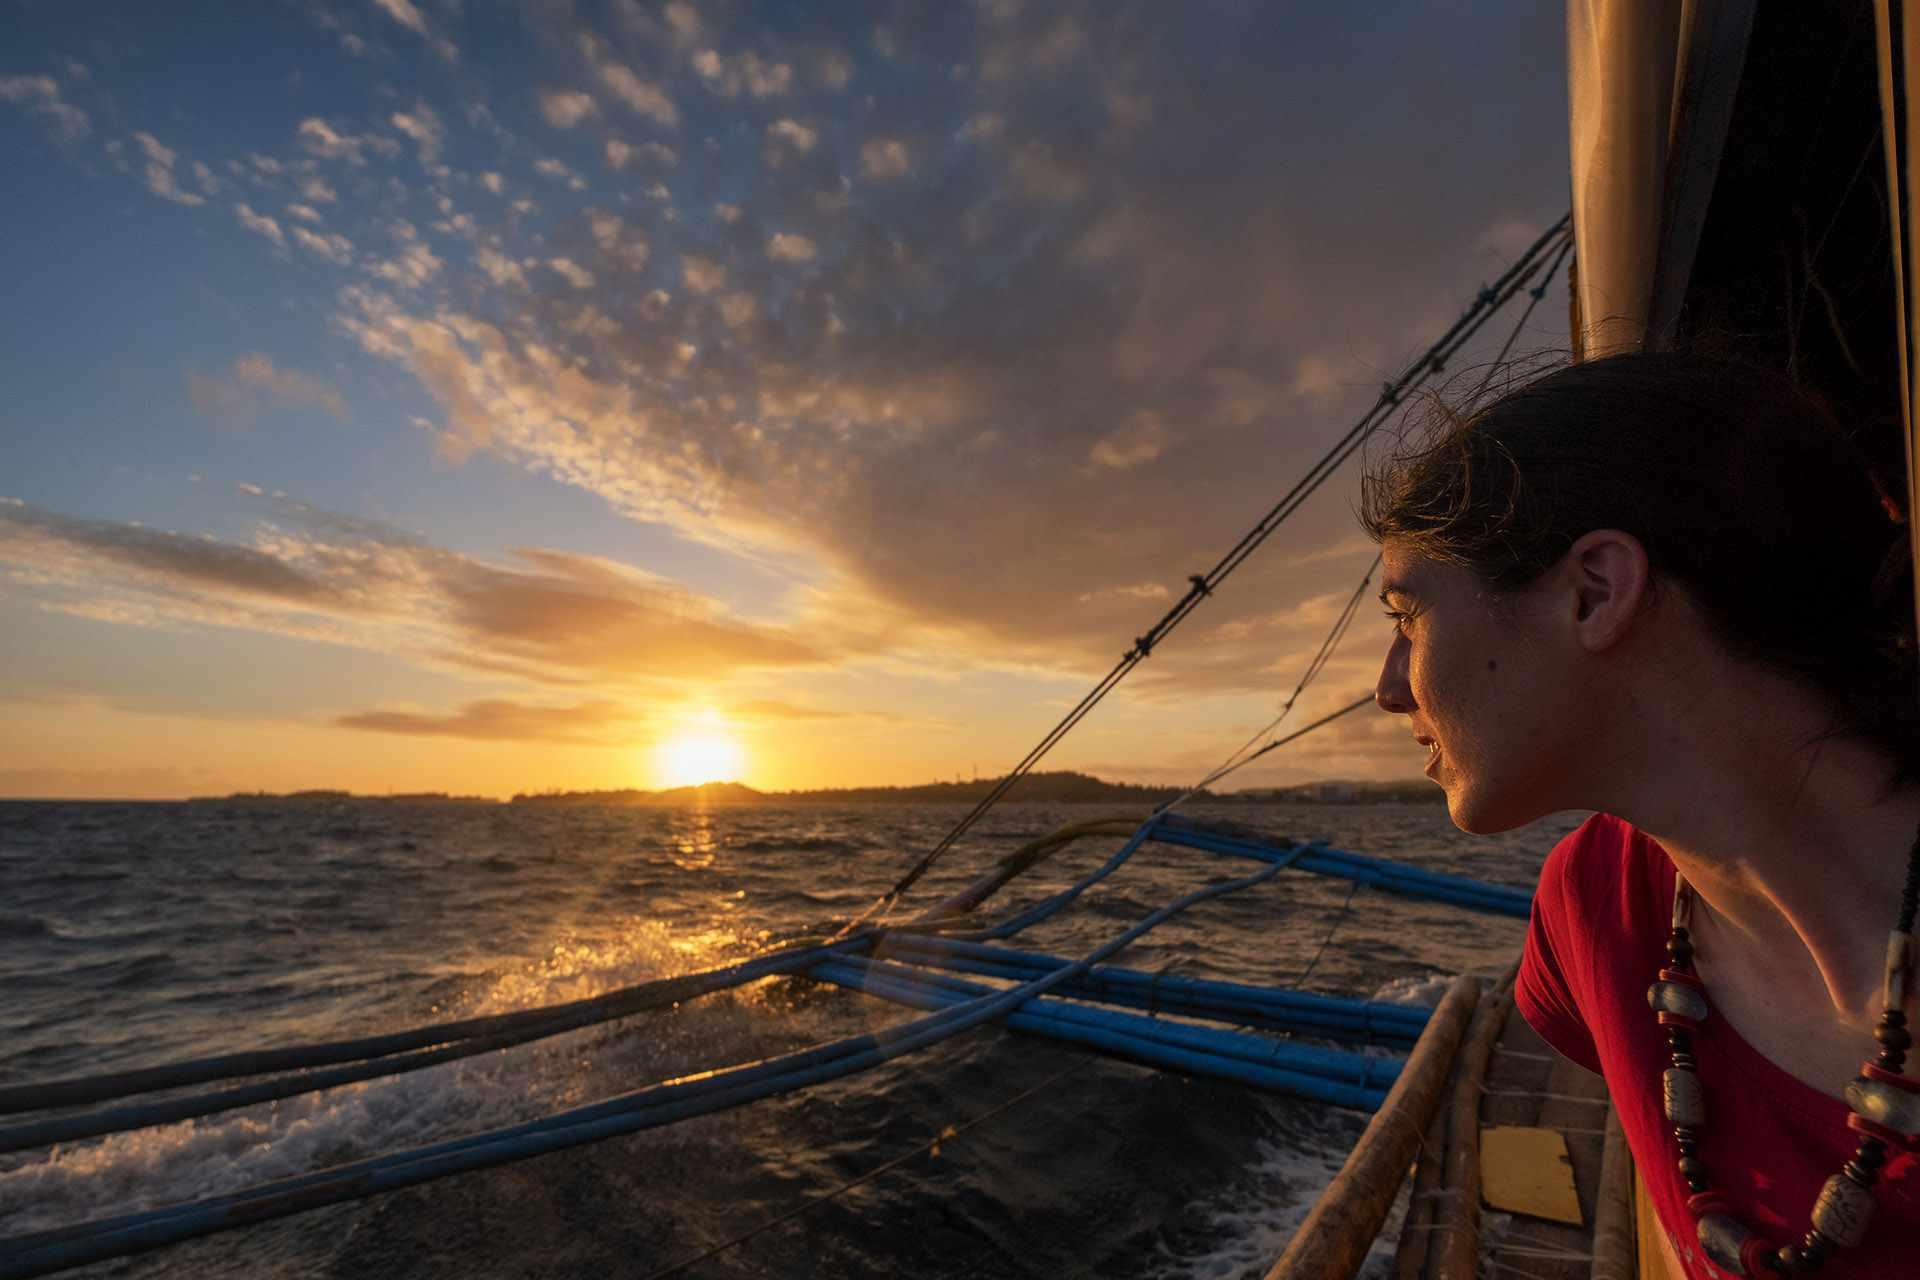 Boat ride to Boracay, Philippines